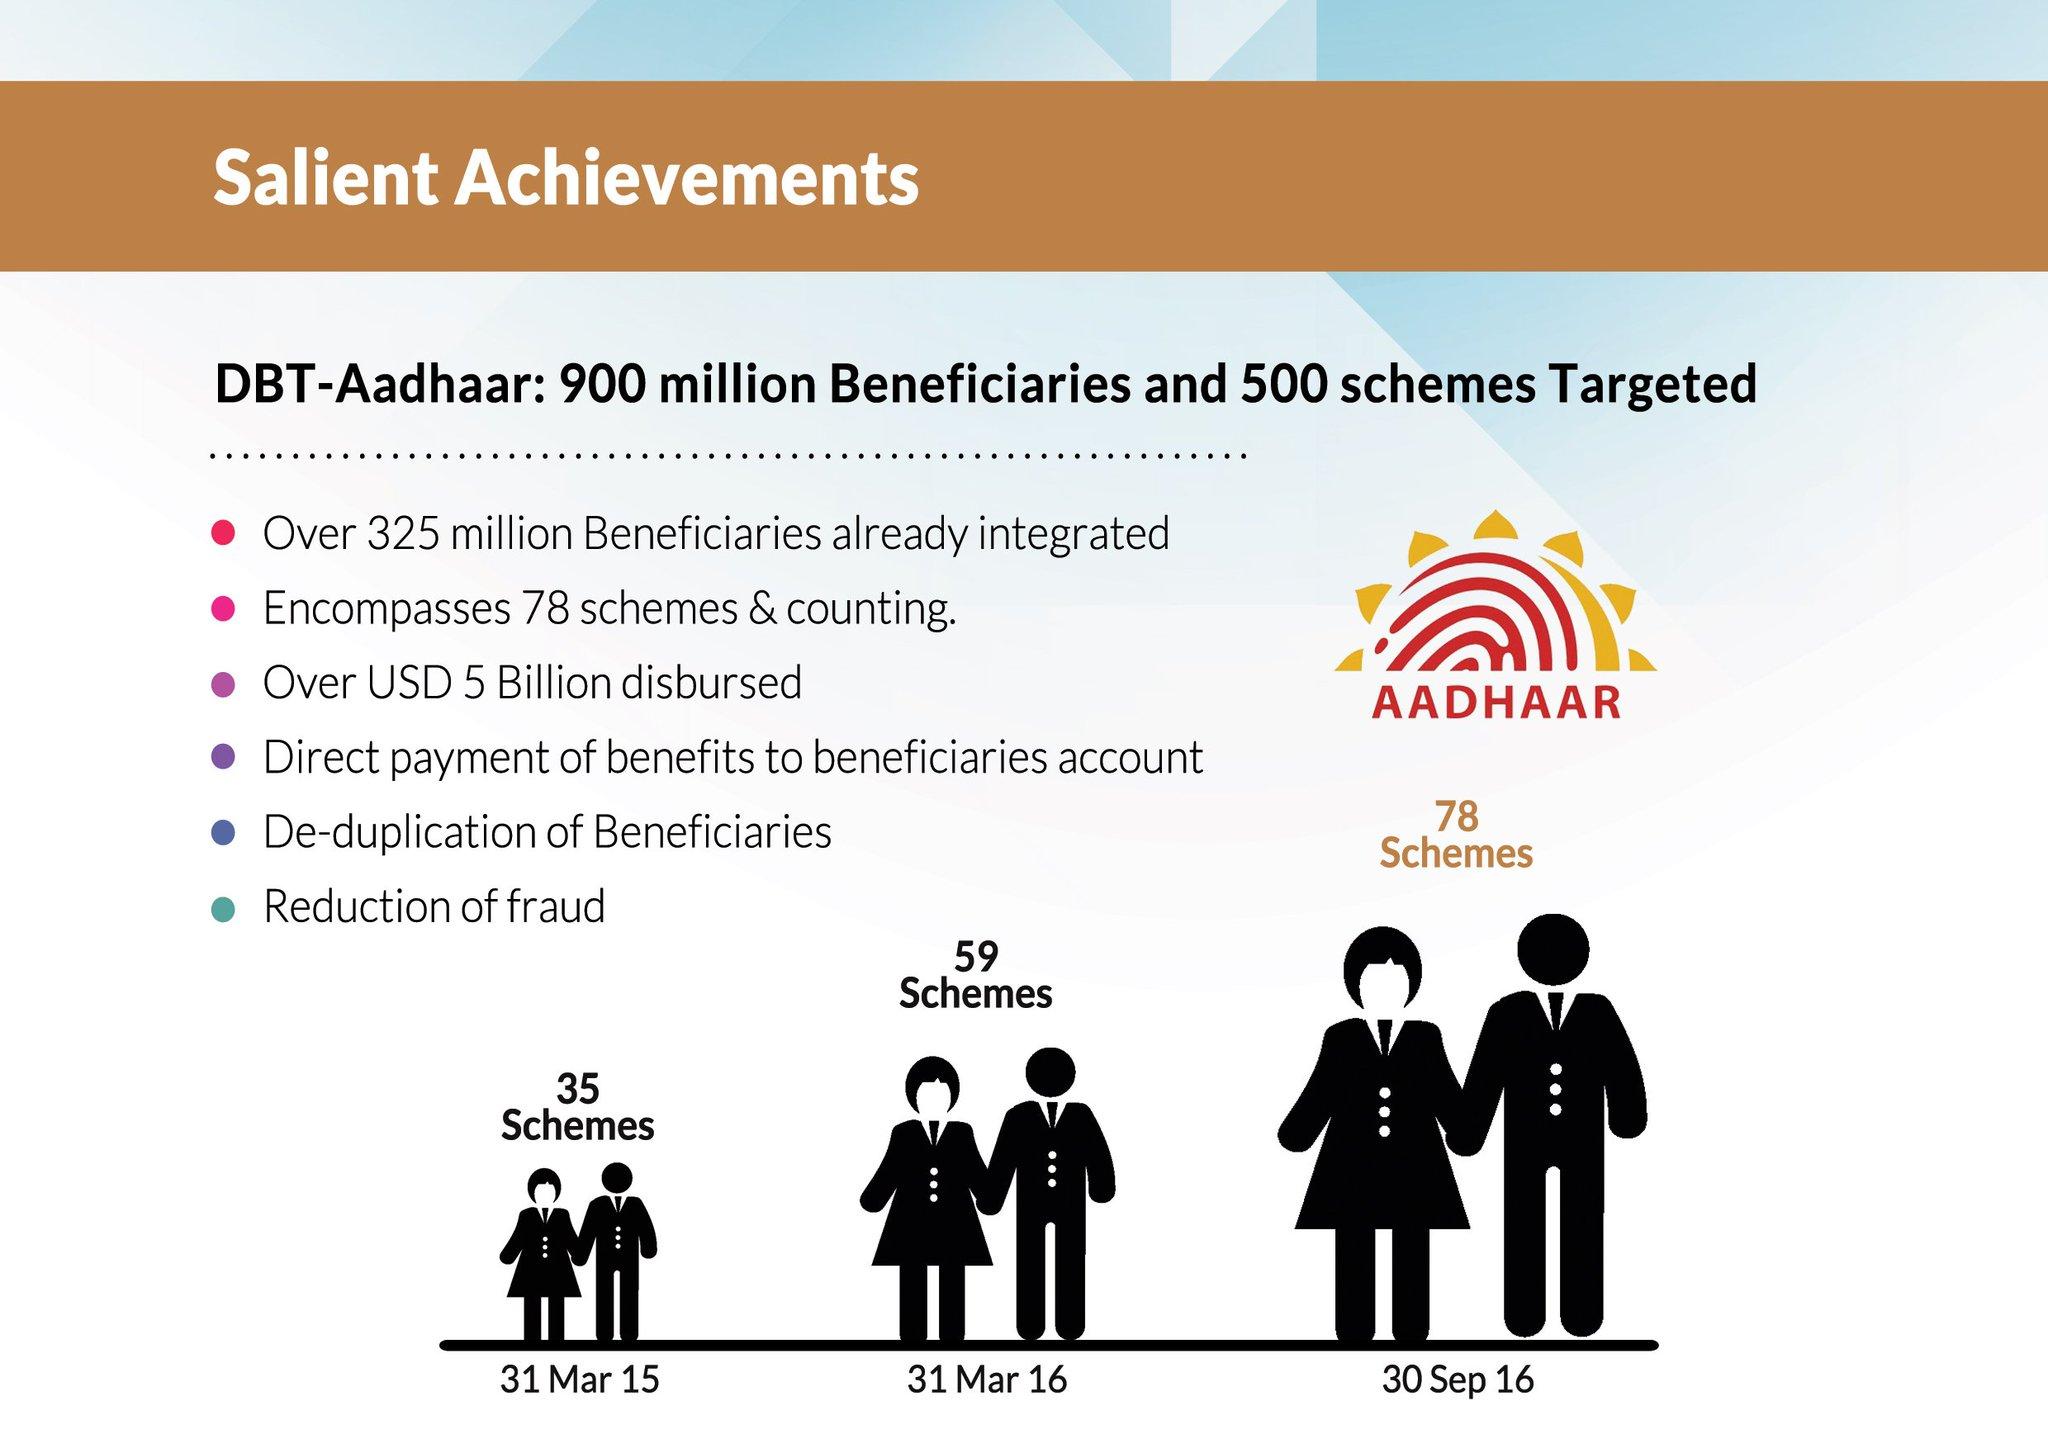 DBT- Aadhaar: 900 million Beneficiaries and 500 schemes Targeted. #TransformingIndia through #DigitalIndia. #EEC2016 https://t.co/Tae0qZuCfh